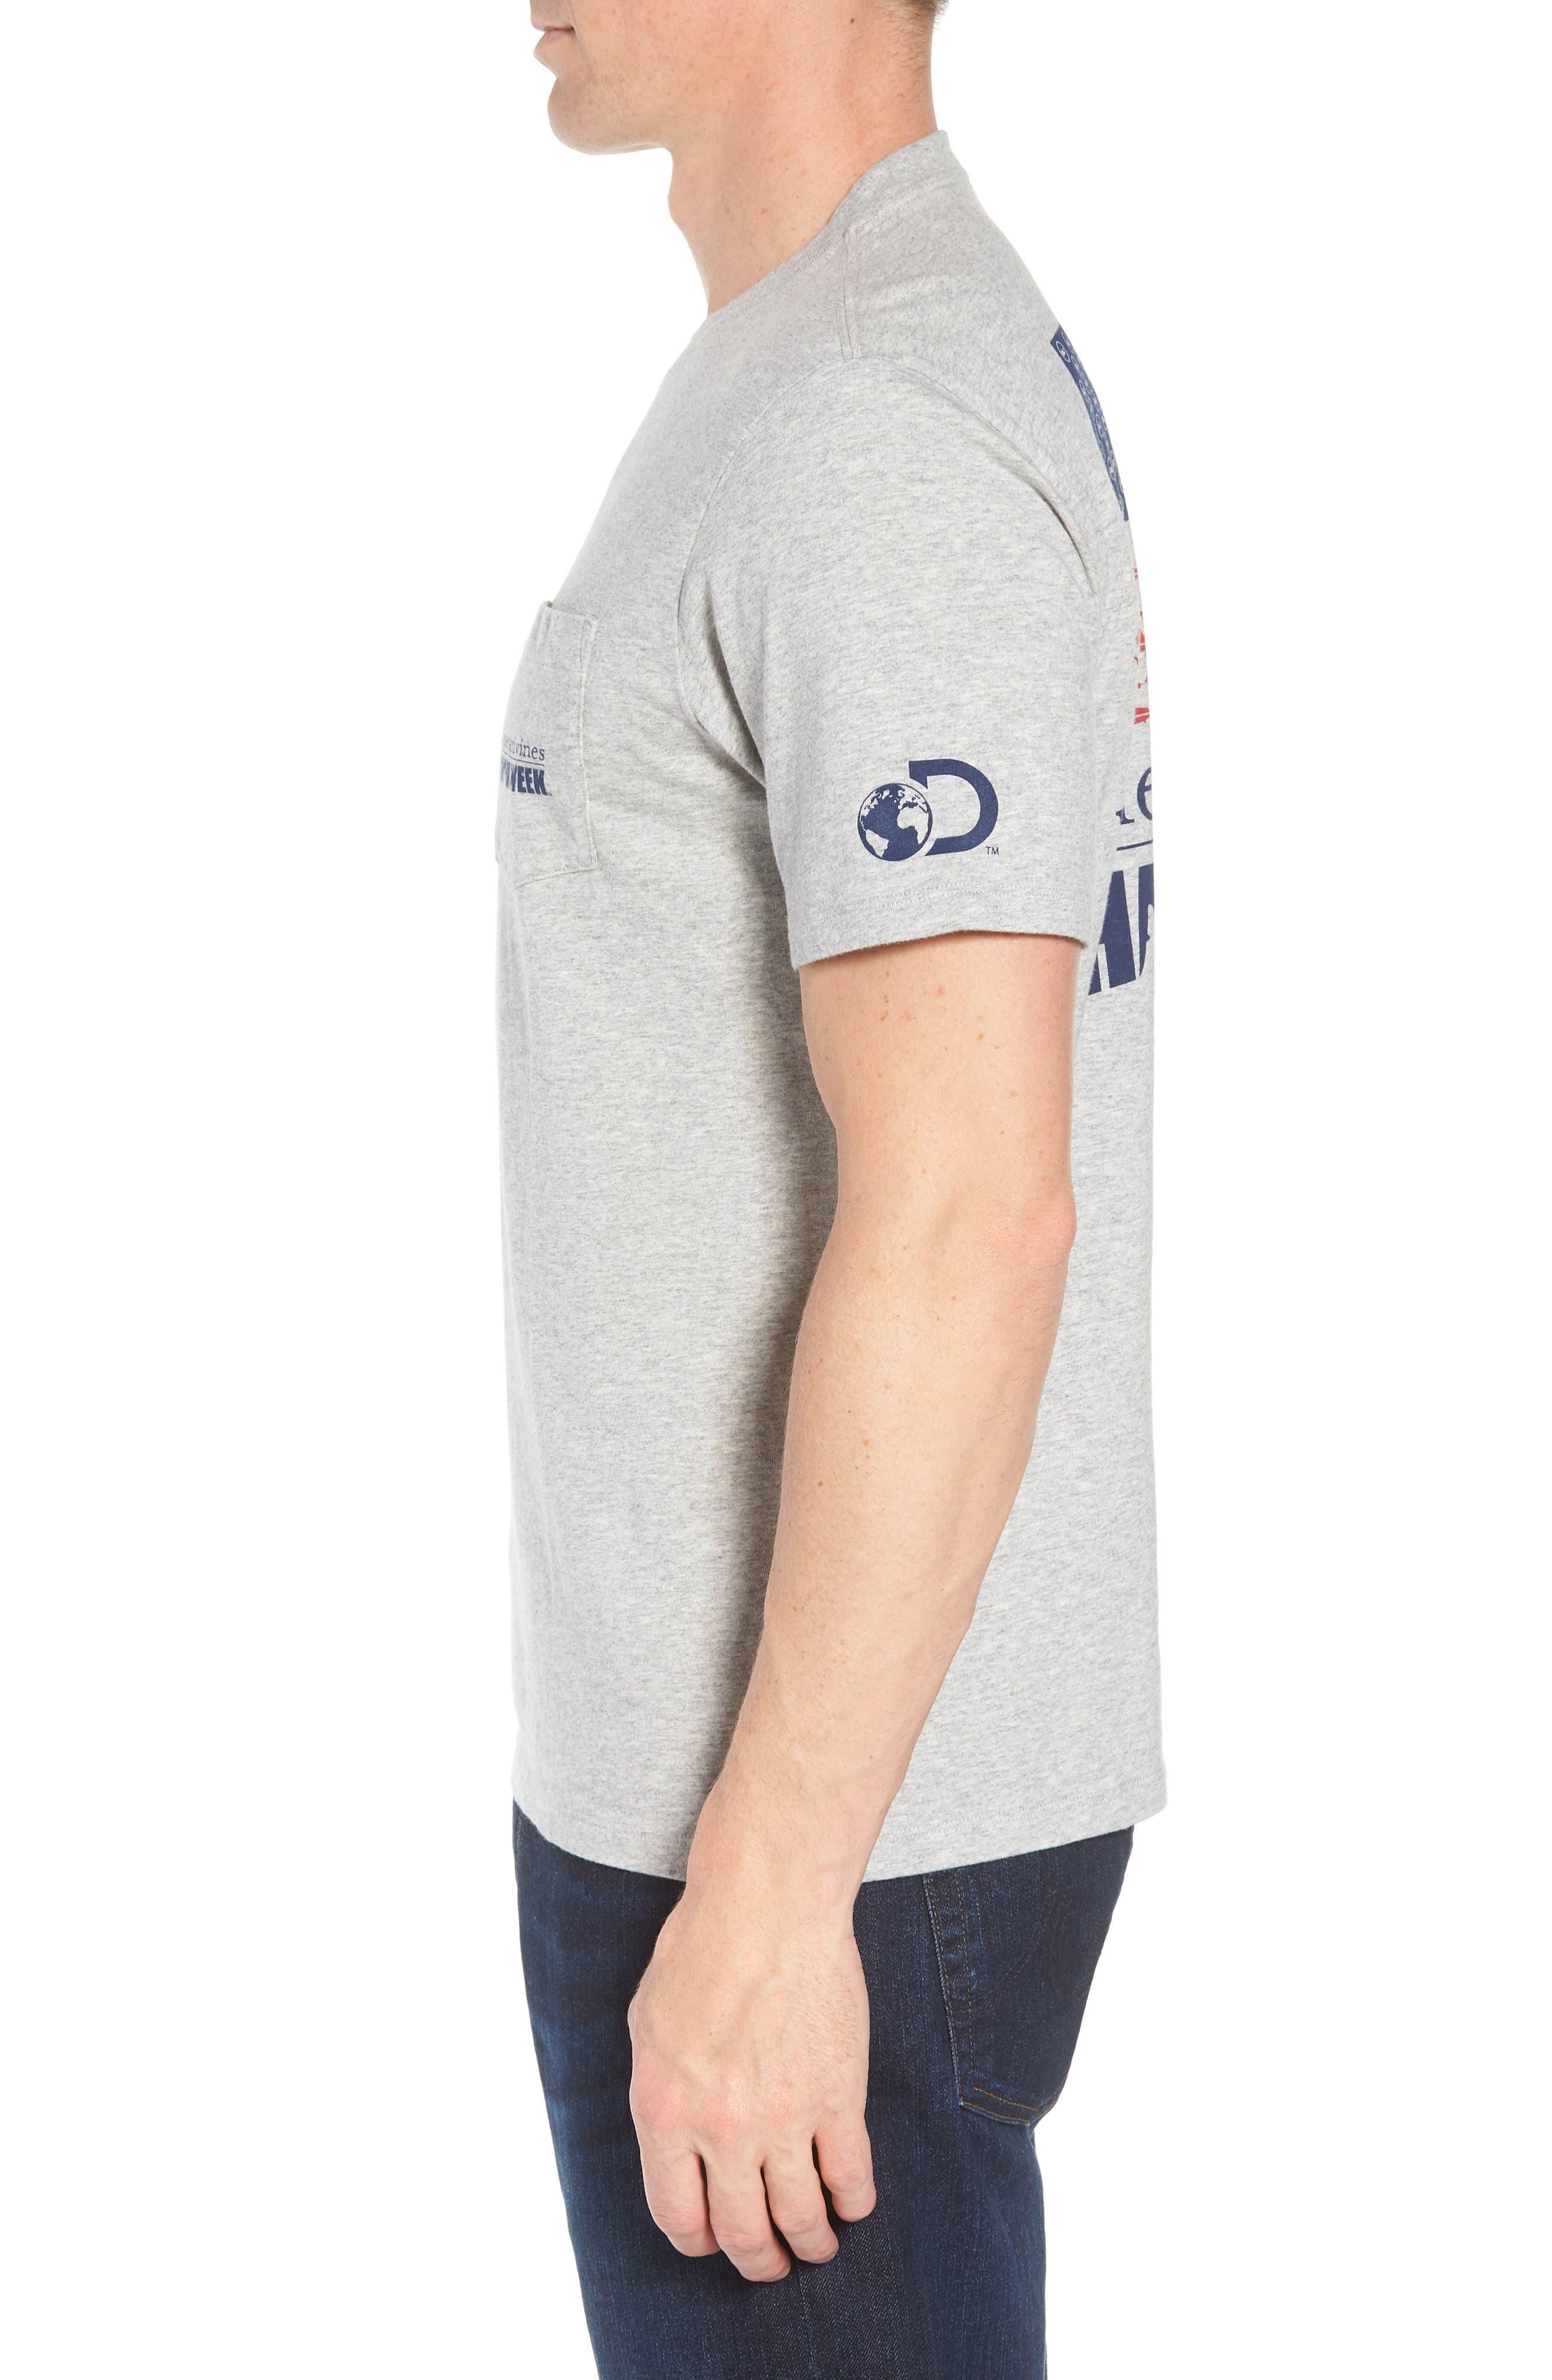 x Shark Week<sup>™</sup> Sharks & Stripes Pocket T-Shirt,                             Alternate thumbnail 4, color,                             Grey Heather